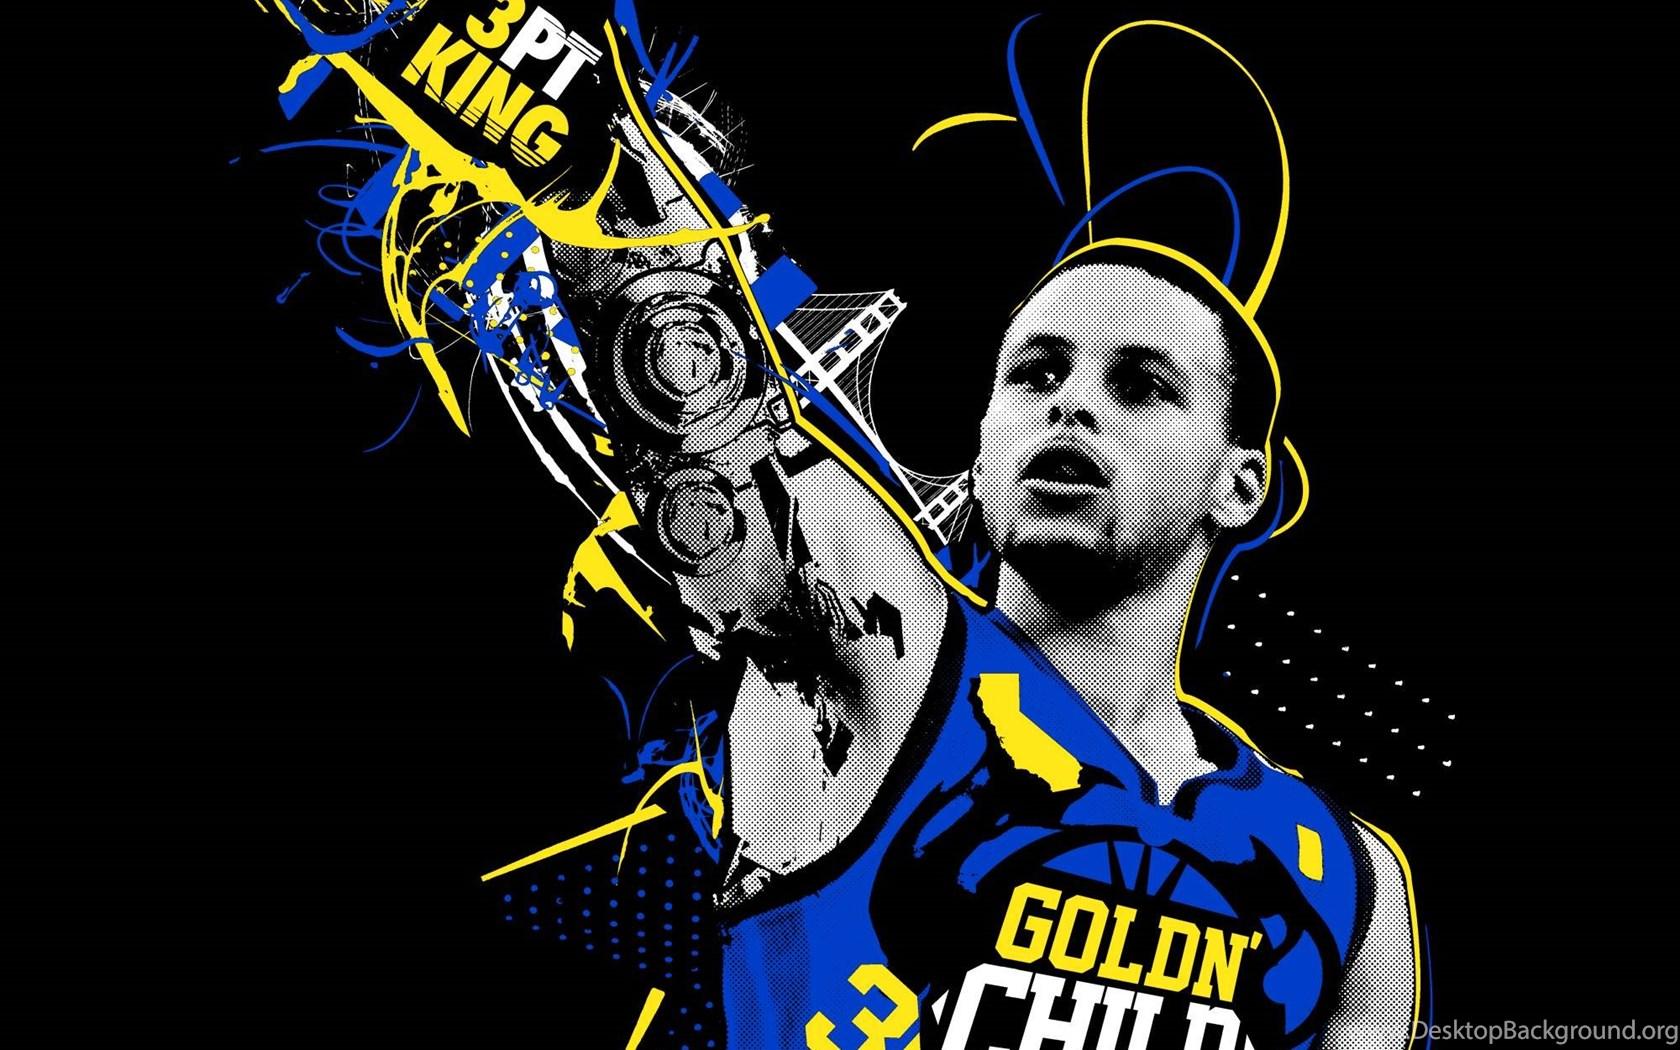 Sport Wallpaper Stephen Curry: Sports Stephen Curry HD NBA Wallpapers Desktop Background